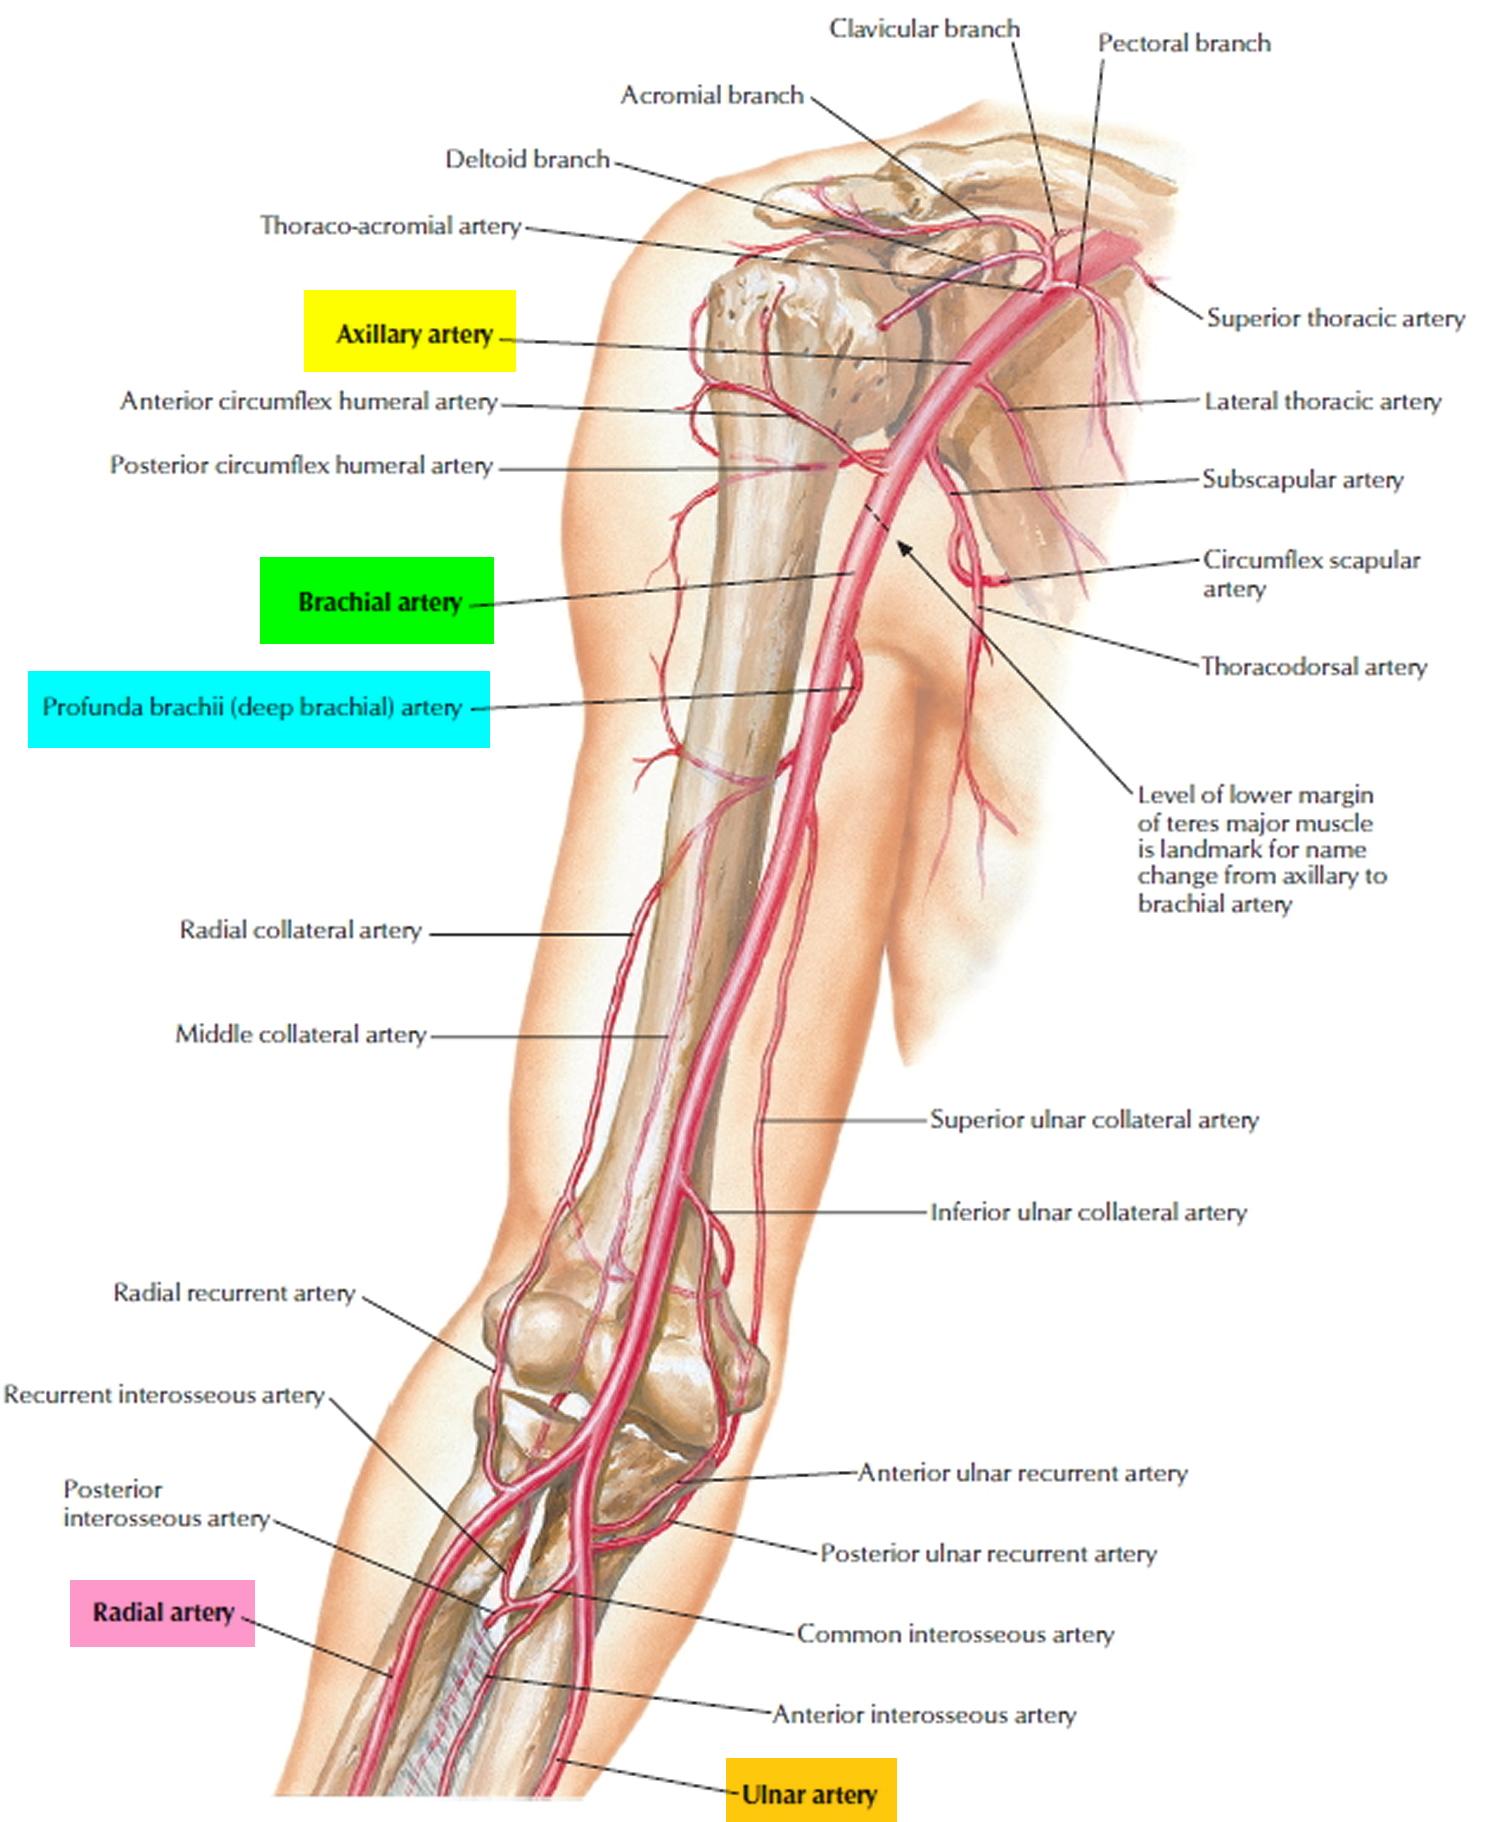 brachial artery branches